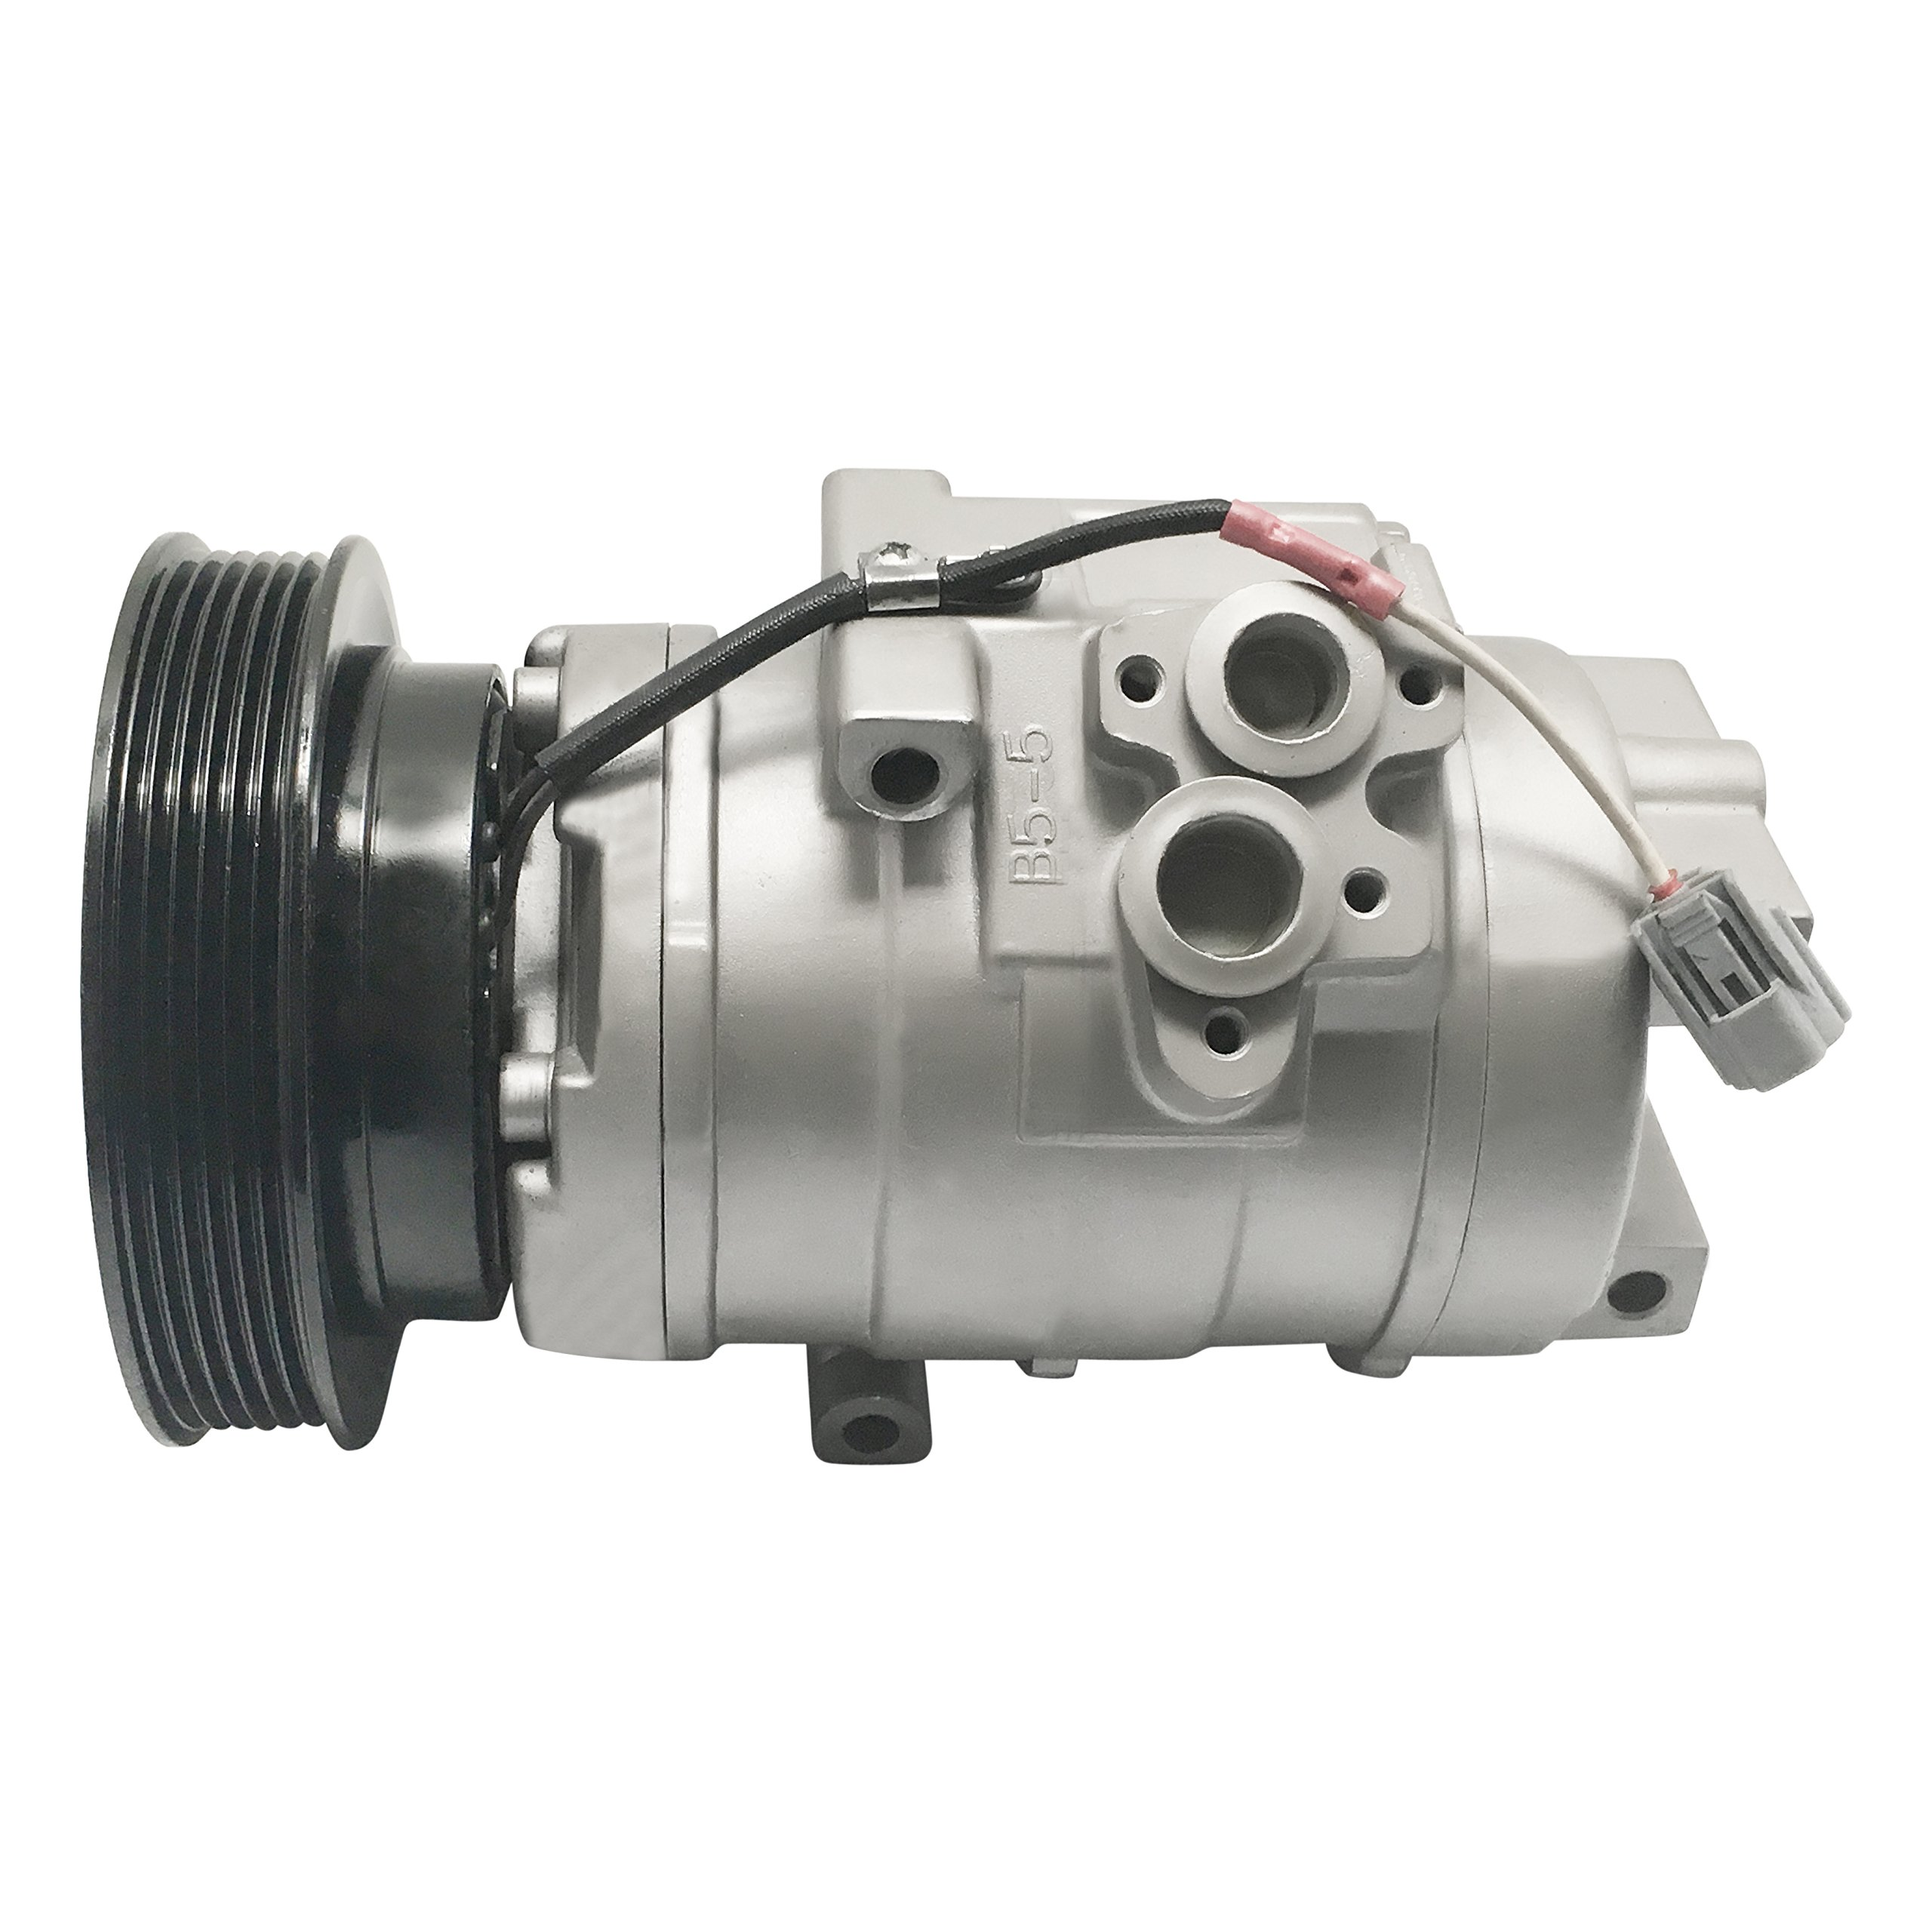 RYC Remanufactured AC Compressor and A/C Clutch GG342